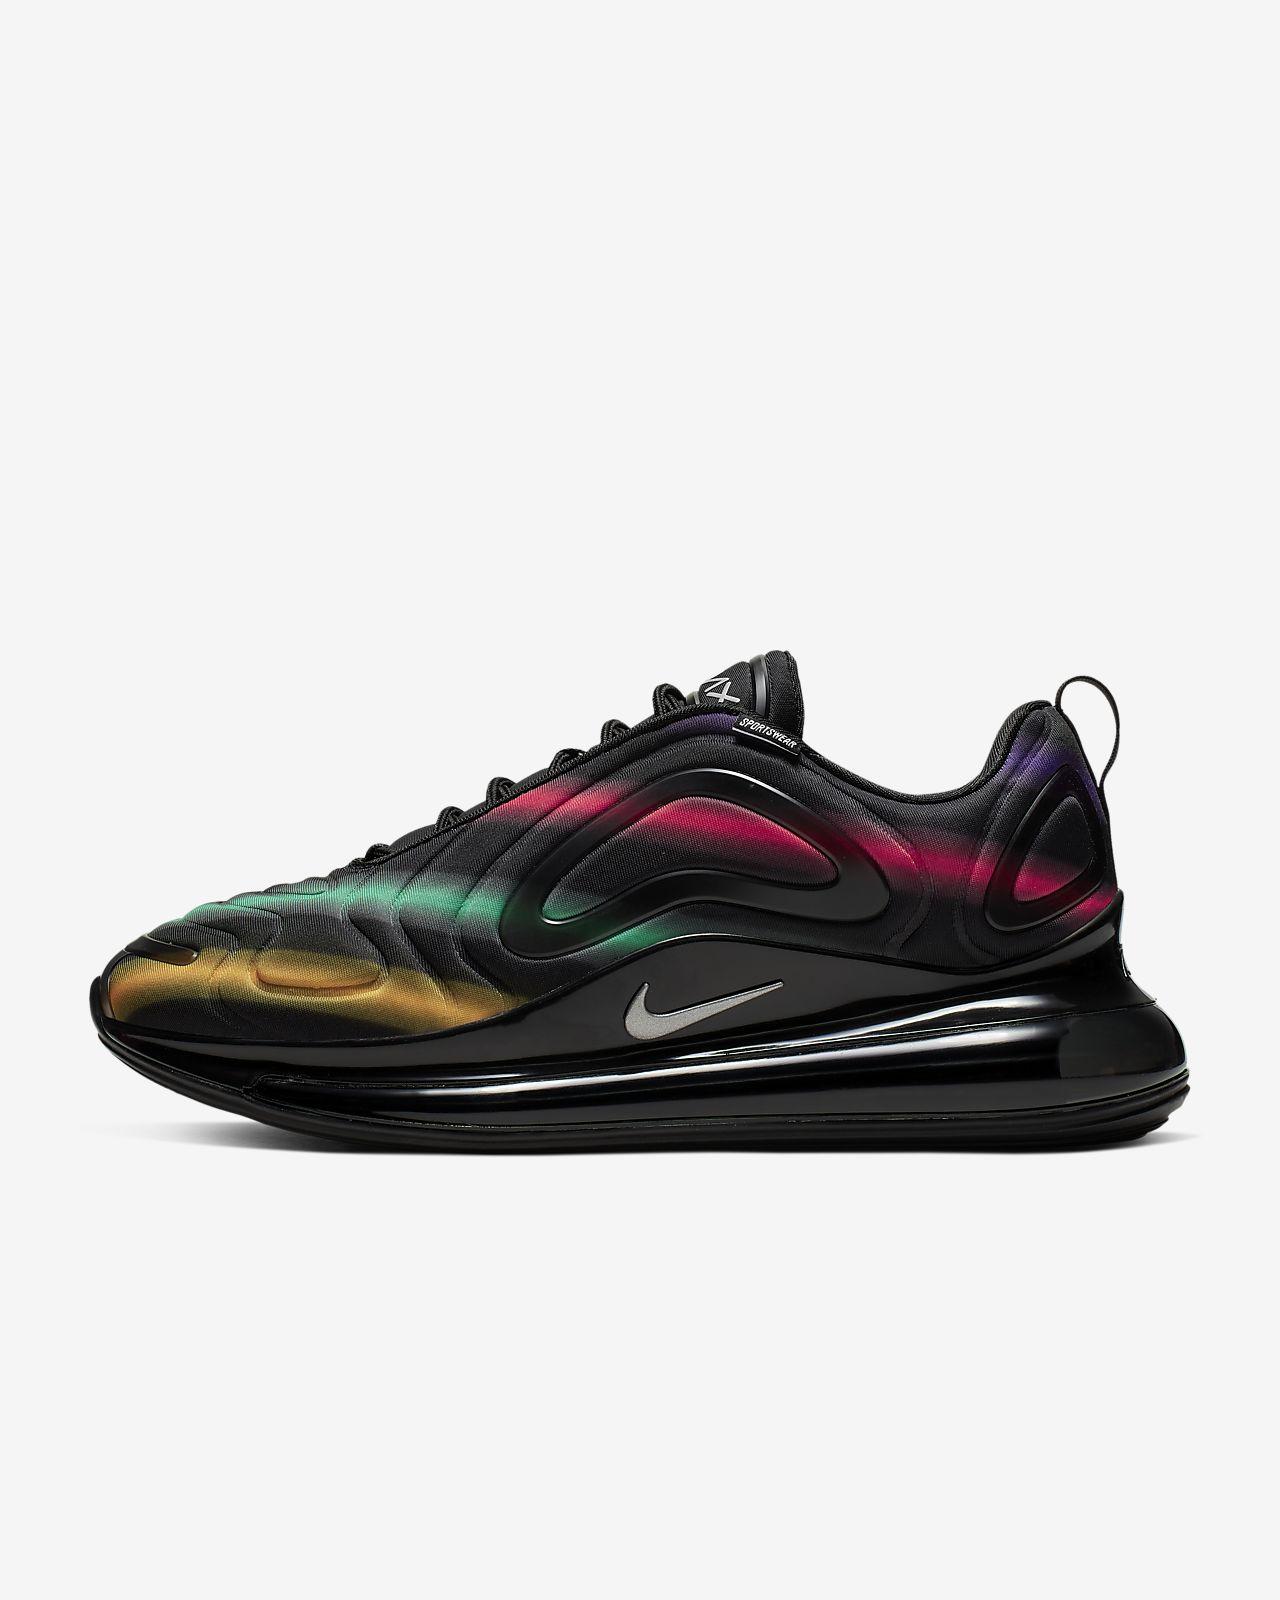 duża obniżka niska cena świetne ceny Nike Air Max 720 Men's Shoe